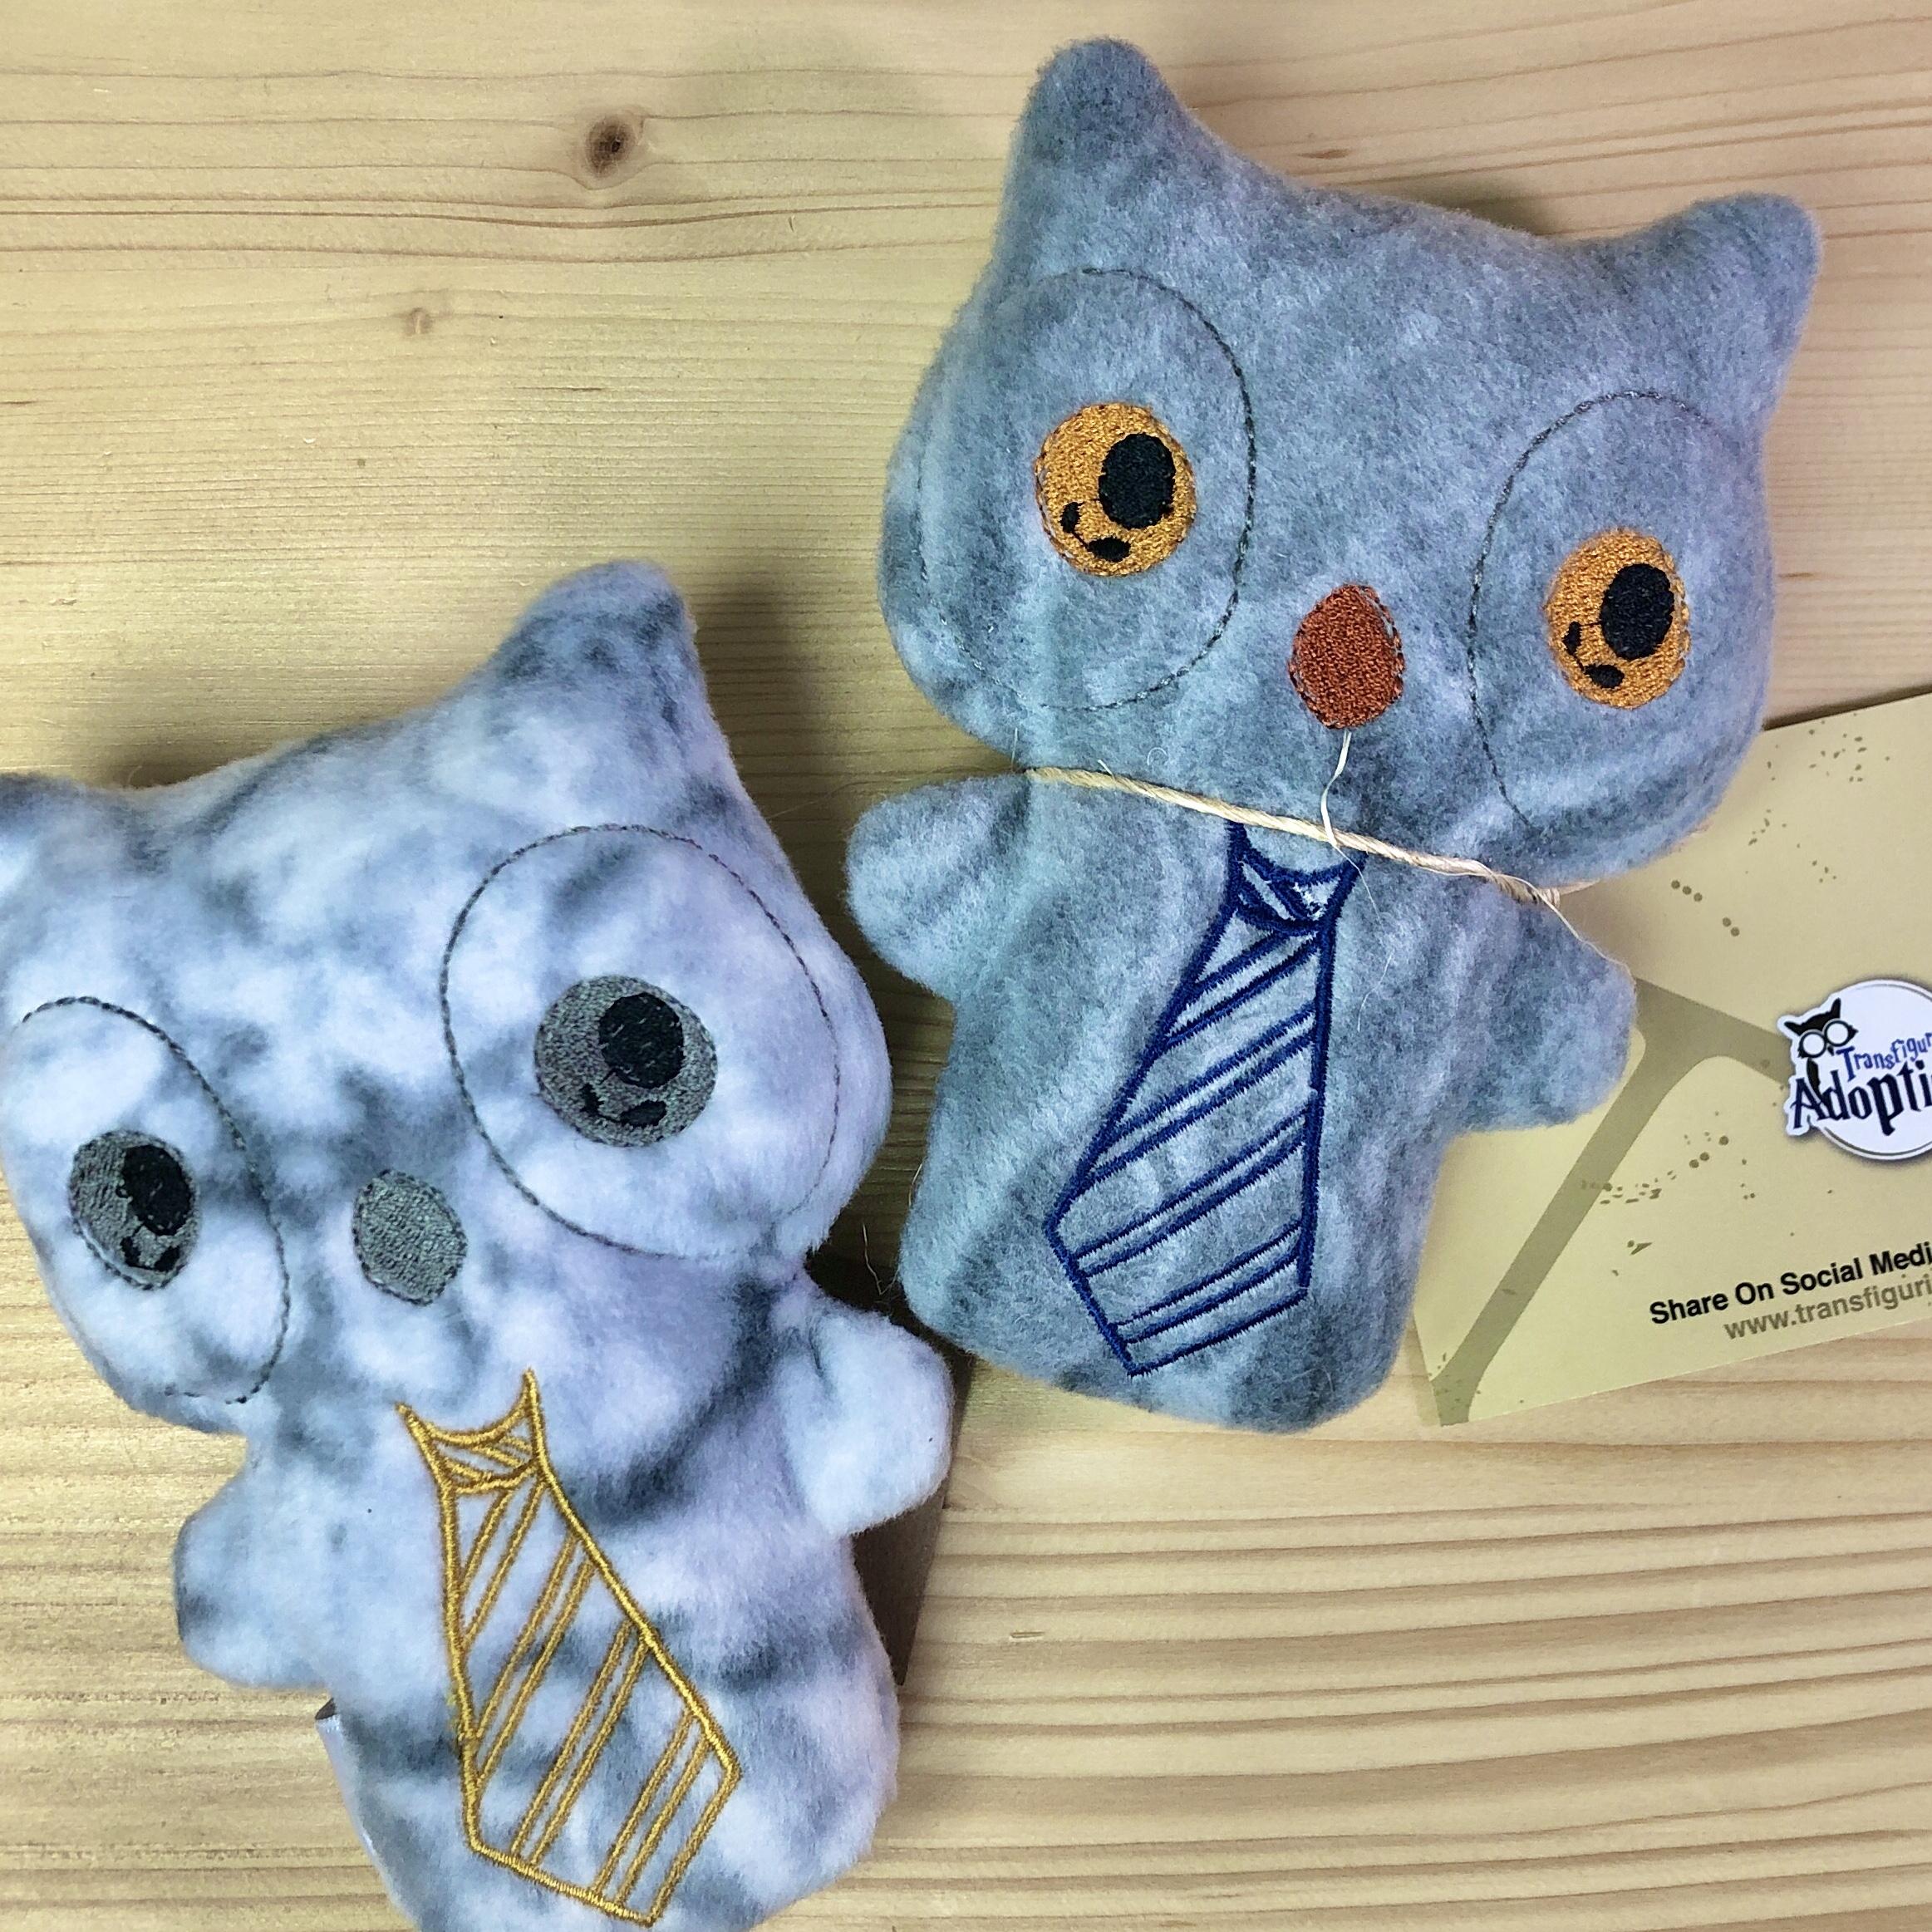 Stuffed Owl Plushie: Adopt A Family